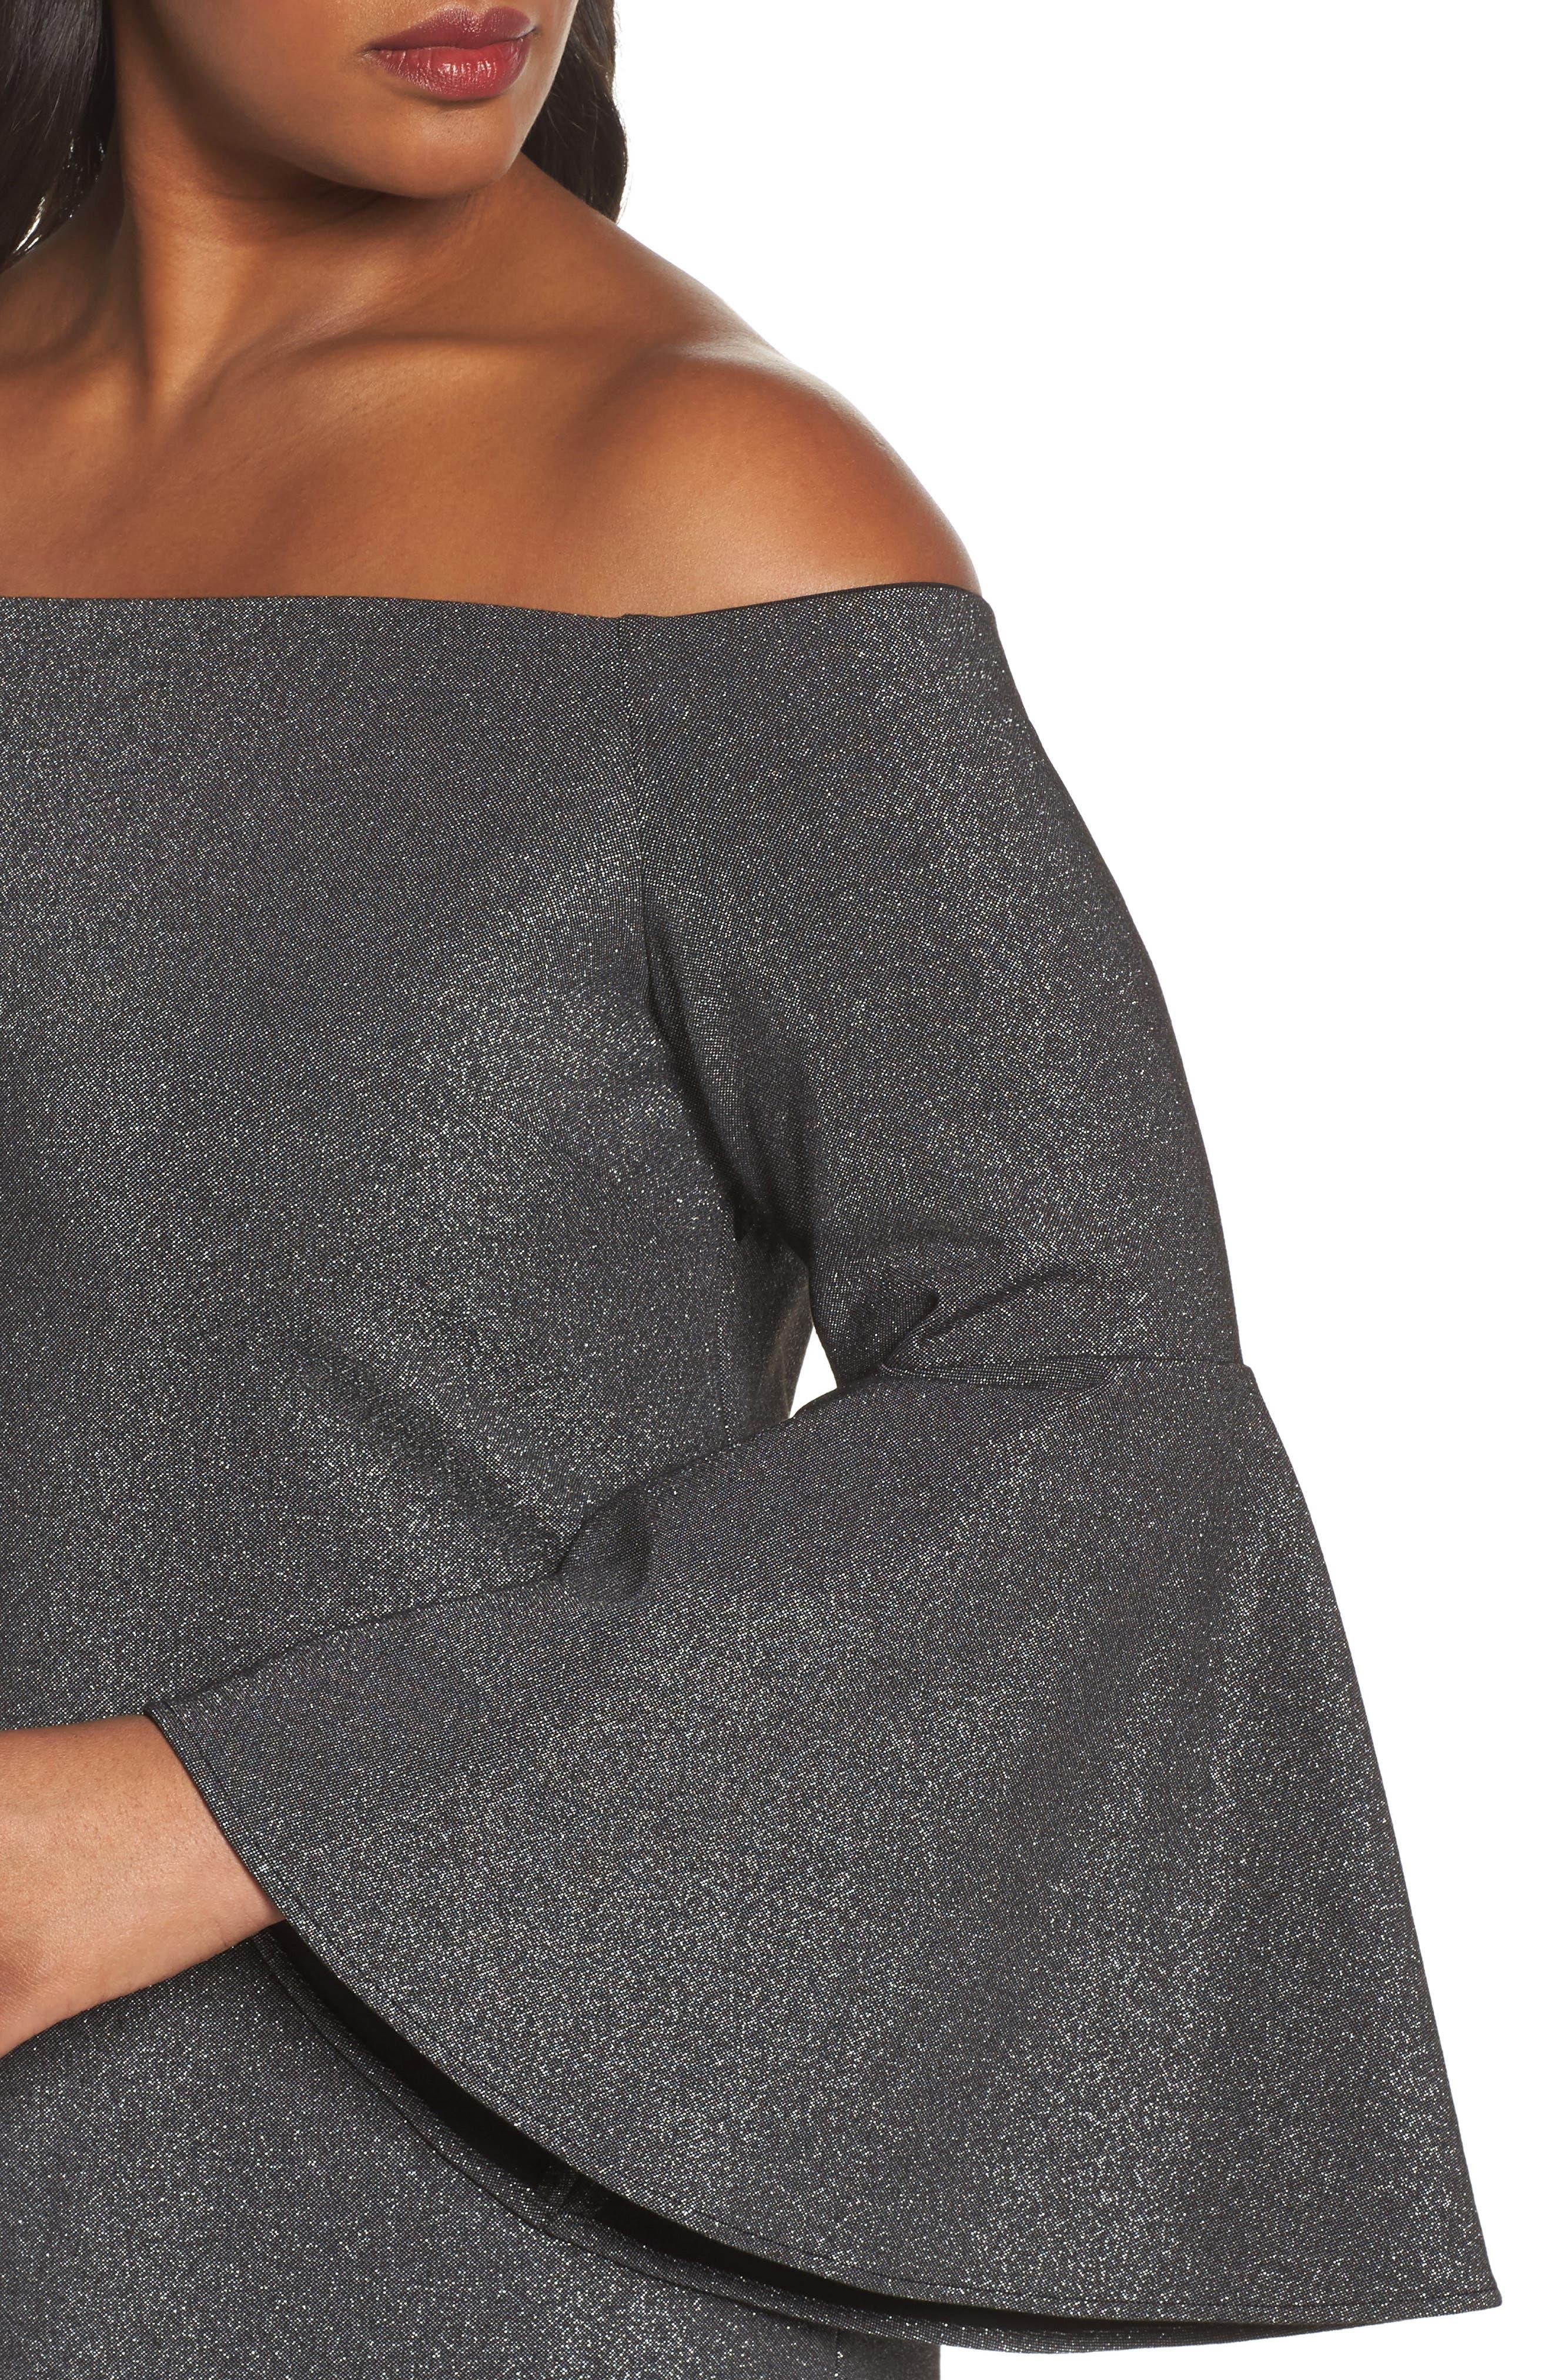 Off the Shoulder Metallic Sheath Dress,                             Alternate thumbnail 4, color,                             006